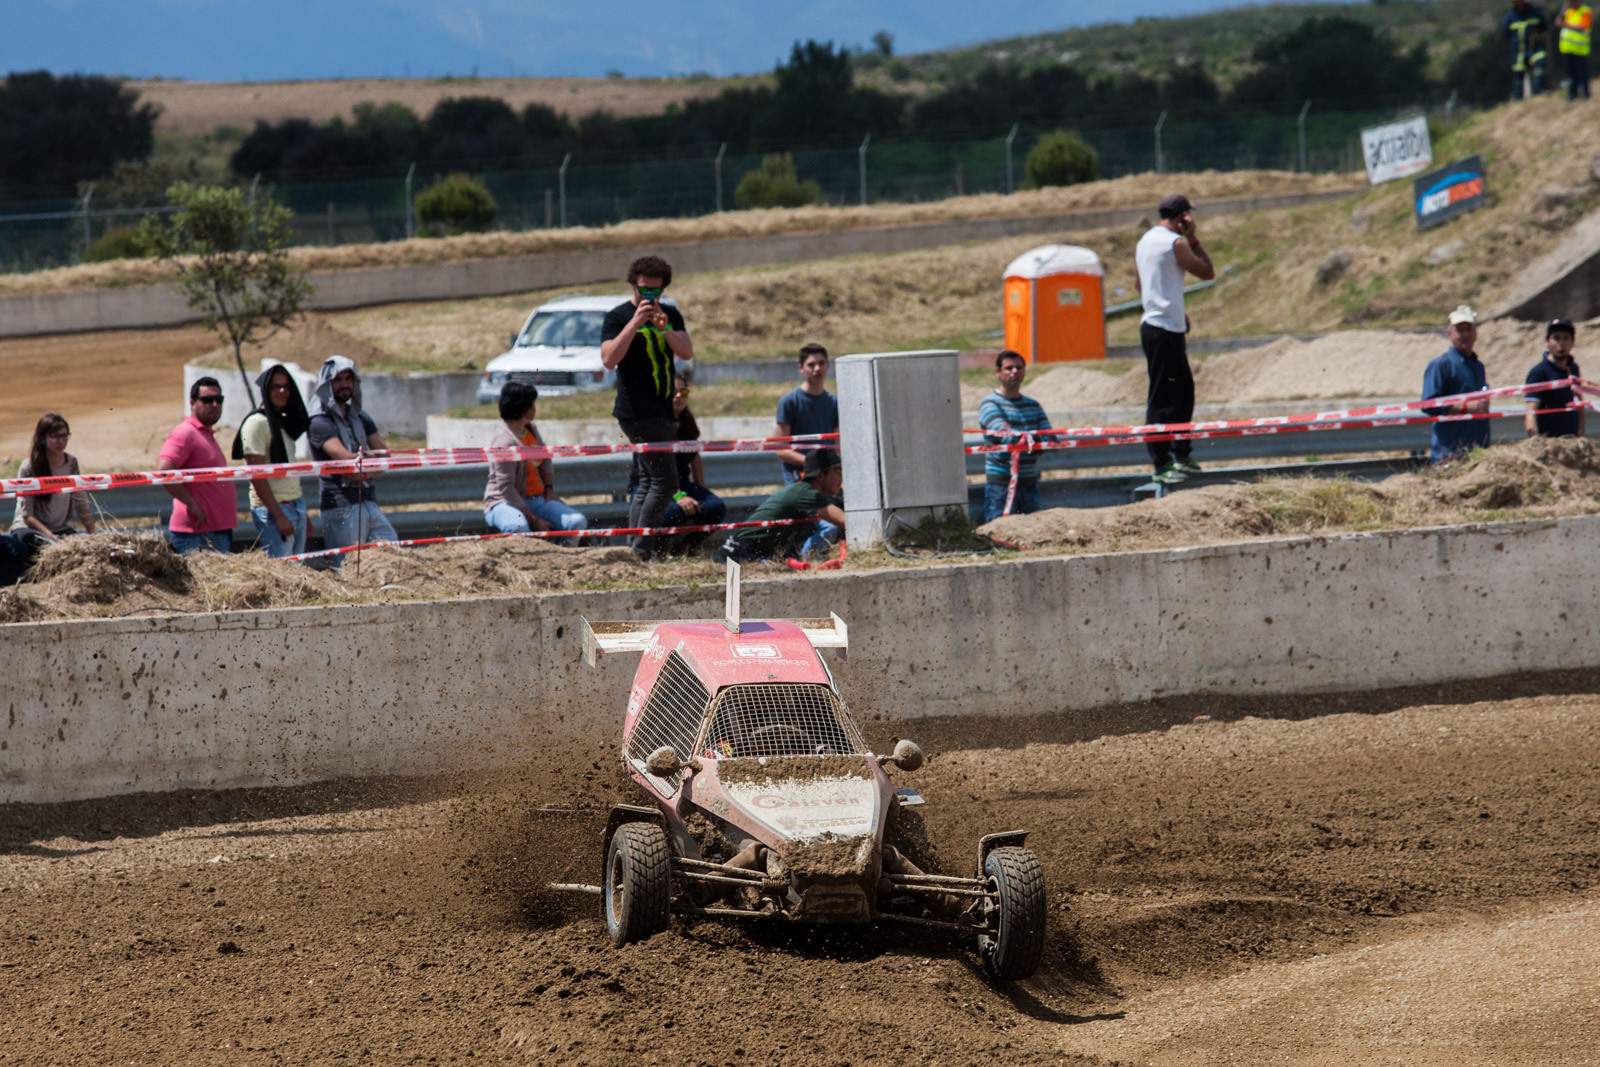 004 Autocross Castelo Branco 2016 020